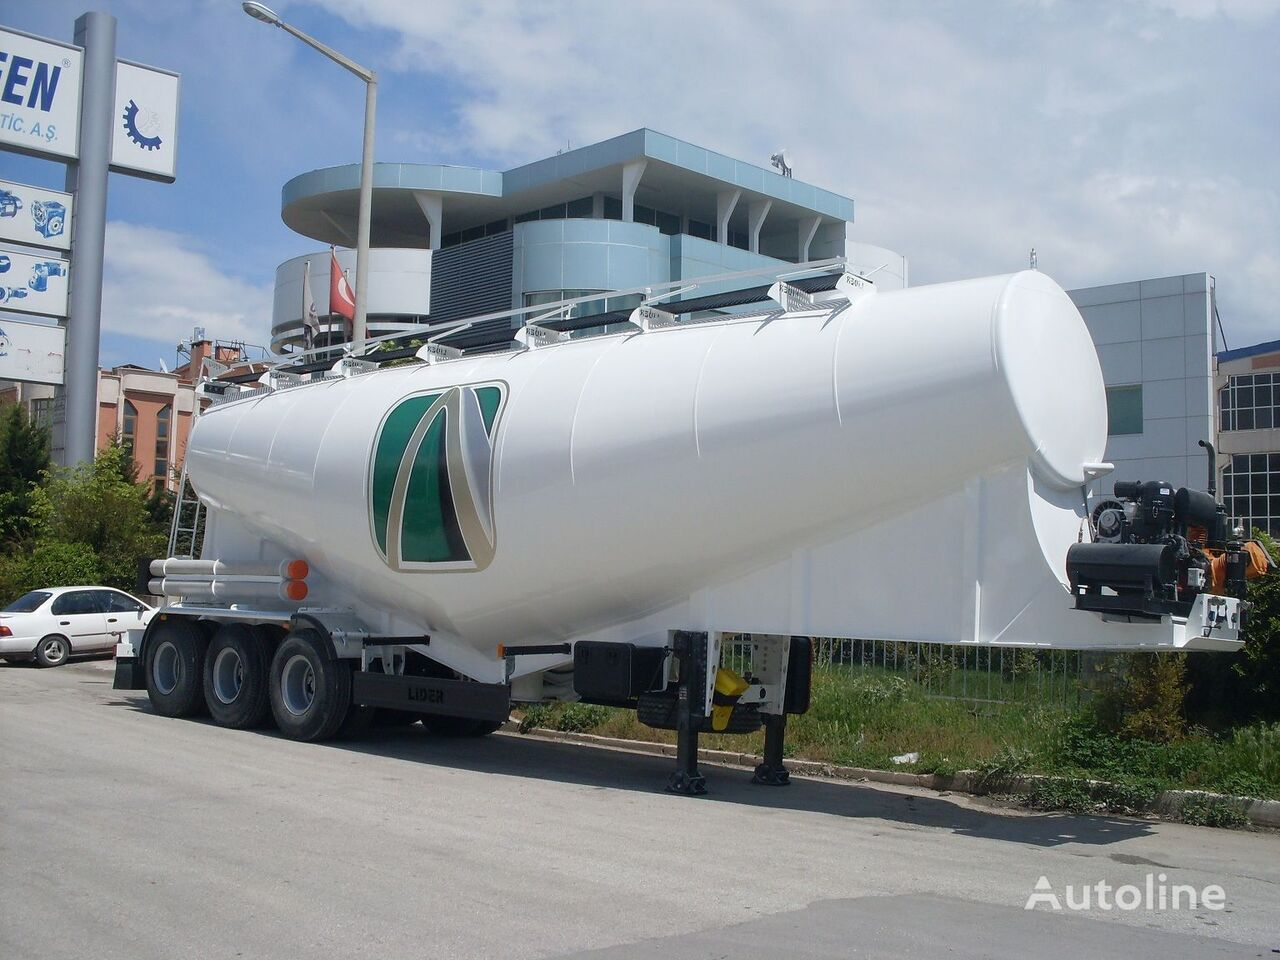 cisterna de cemento LIDER بلكر اسمنت مواصفات اوربية 2019 nueva